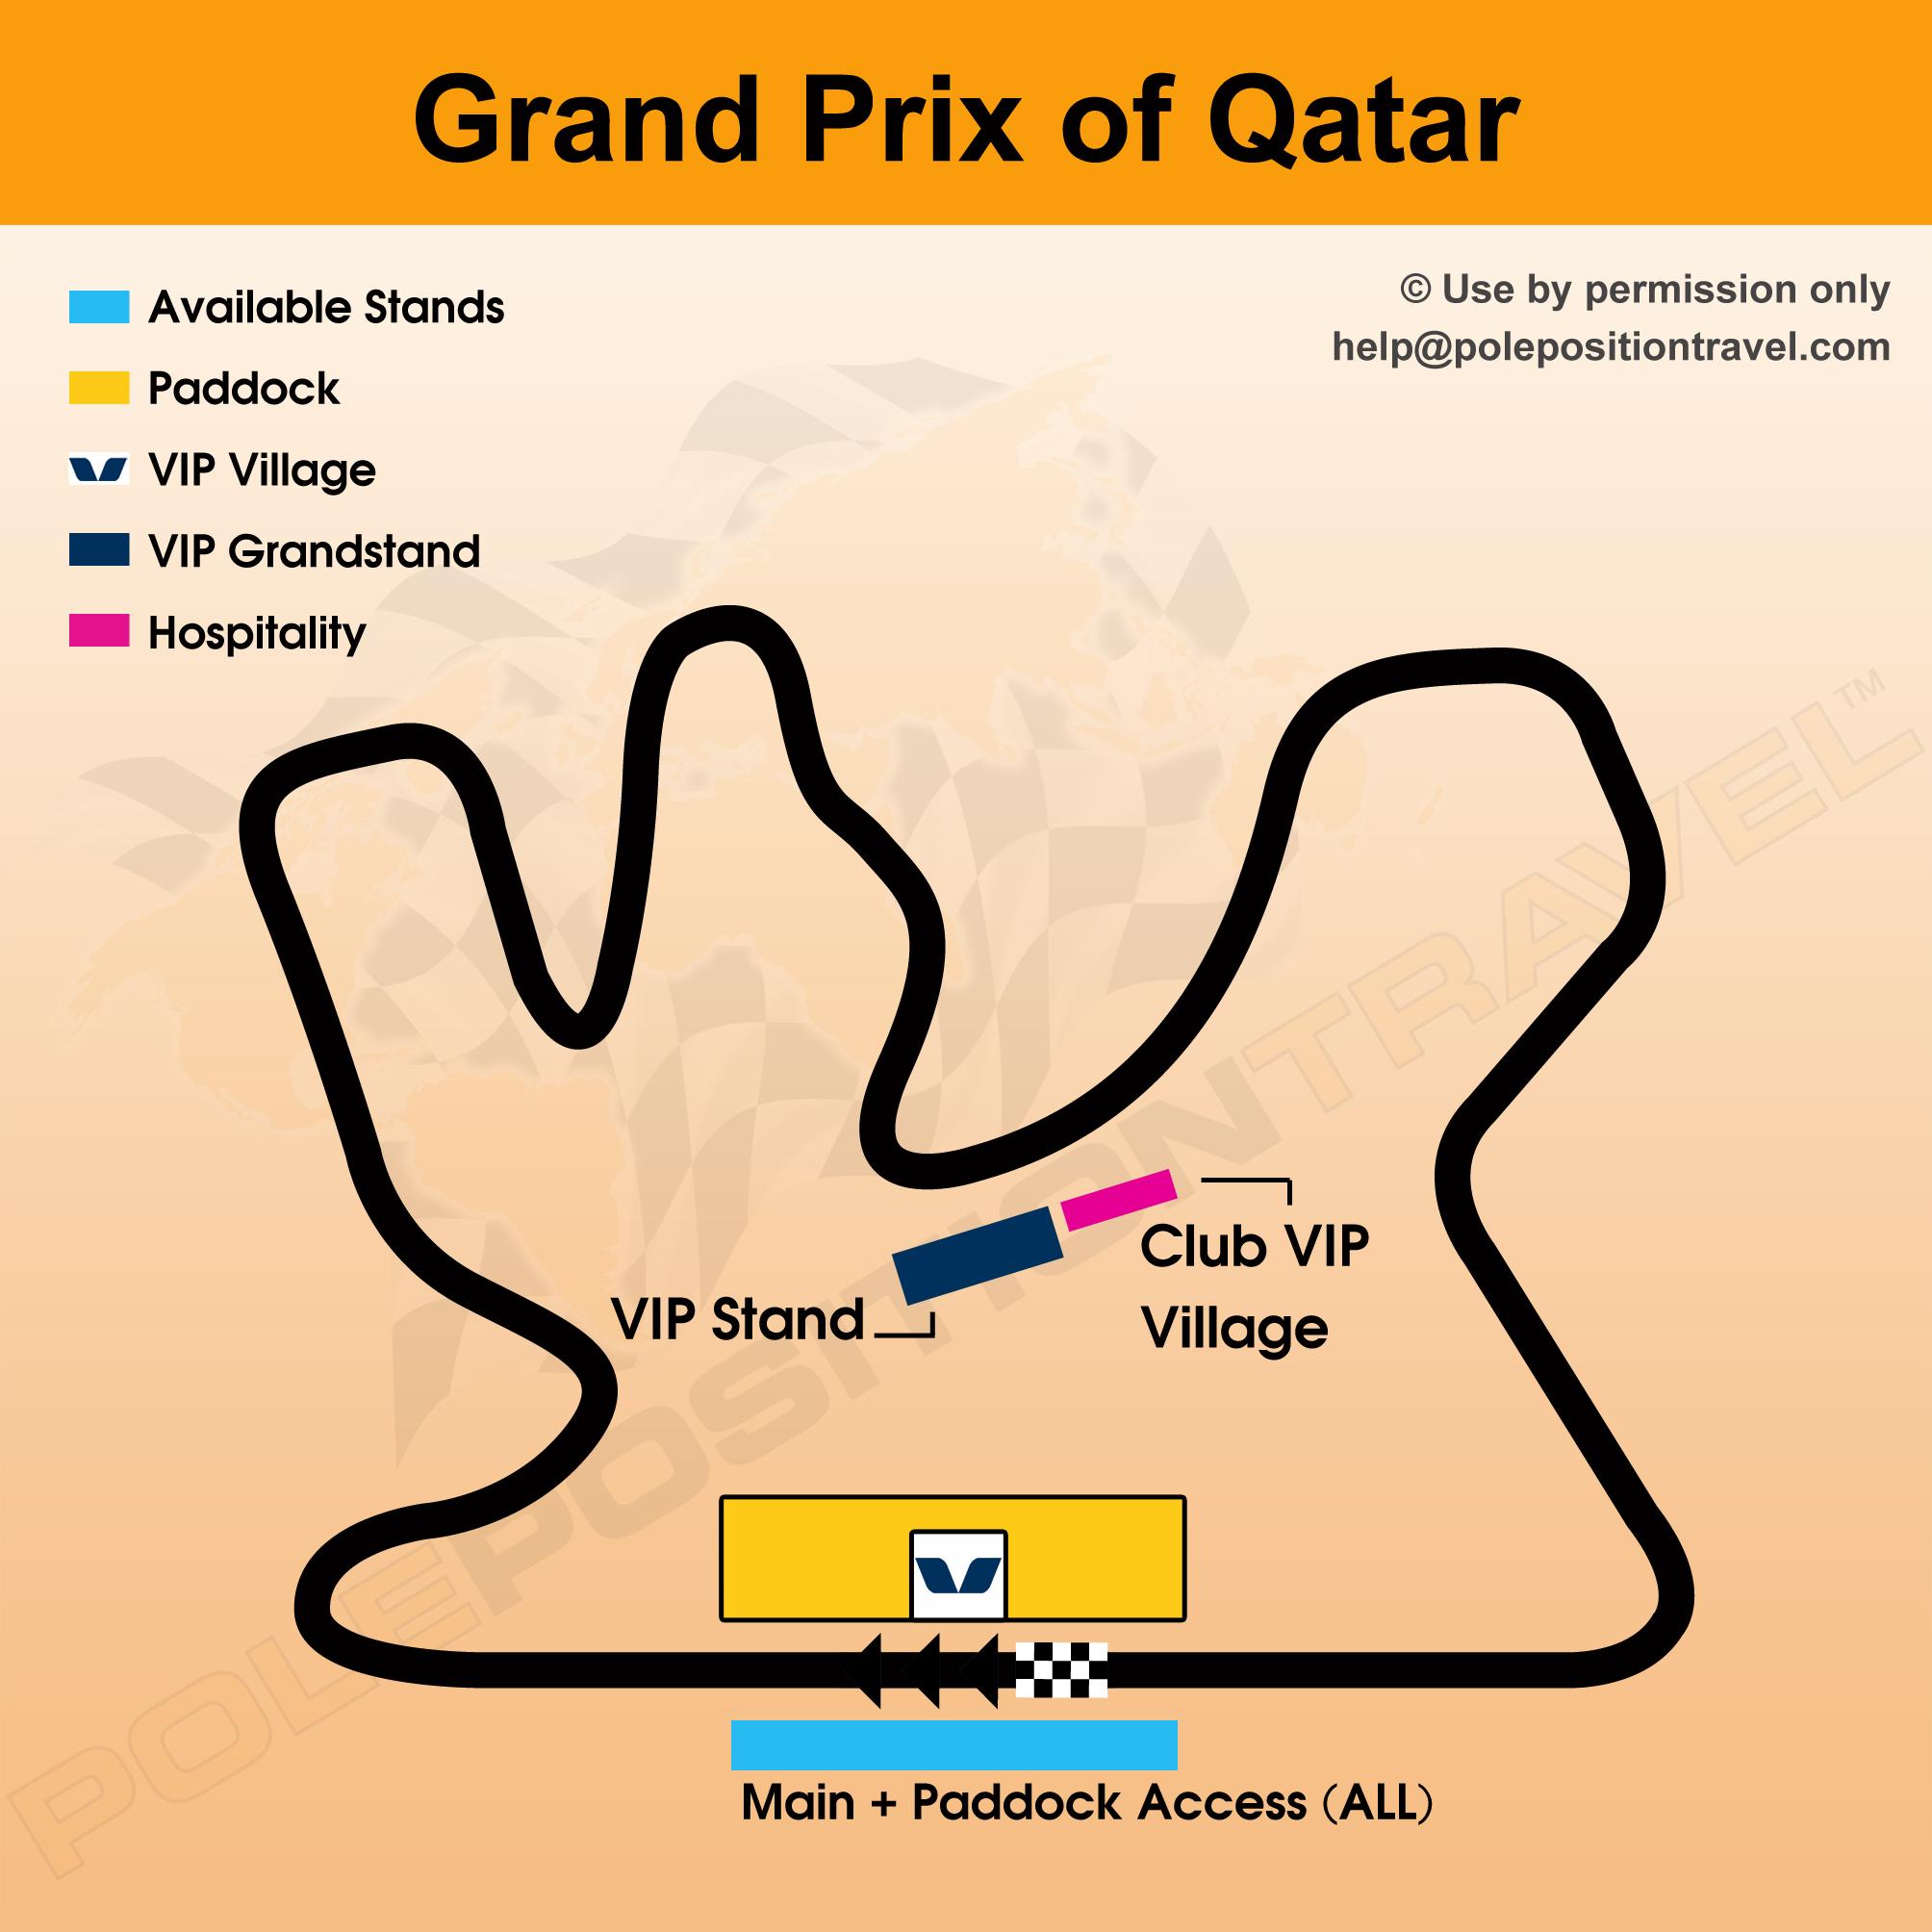 Grand Prix of Qatar 2018 Circuit map